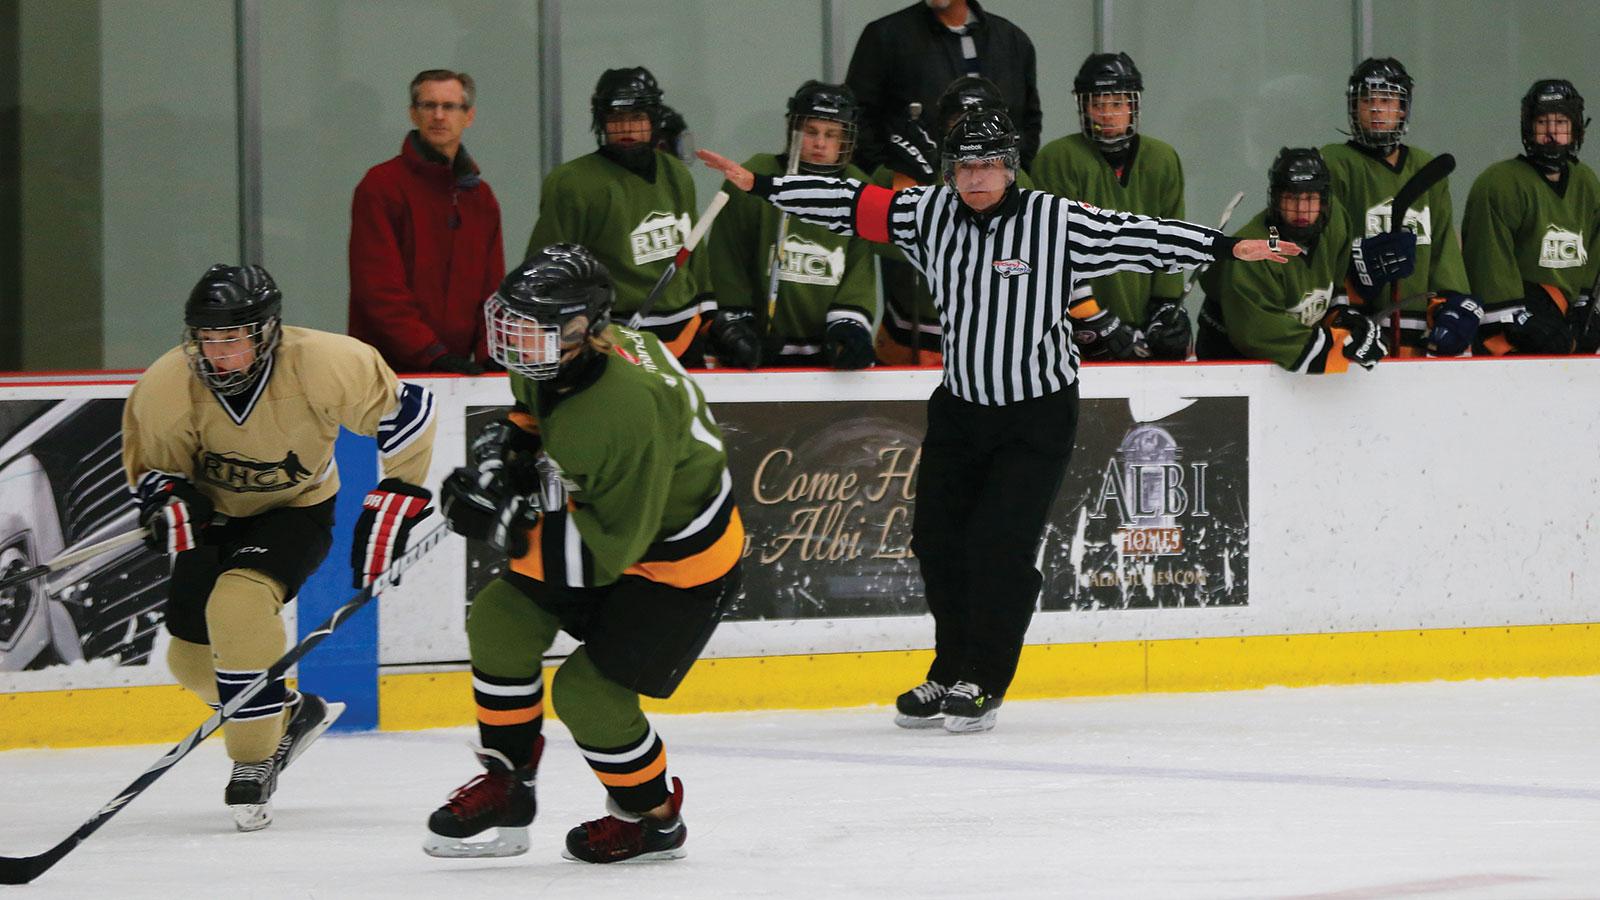 The new minor hockey fights